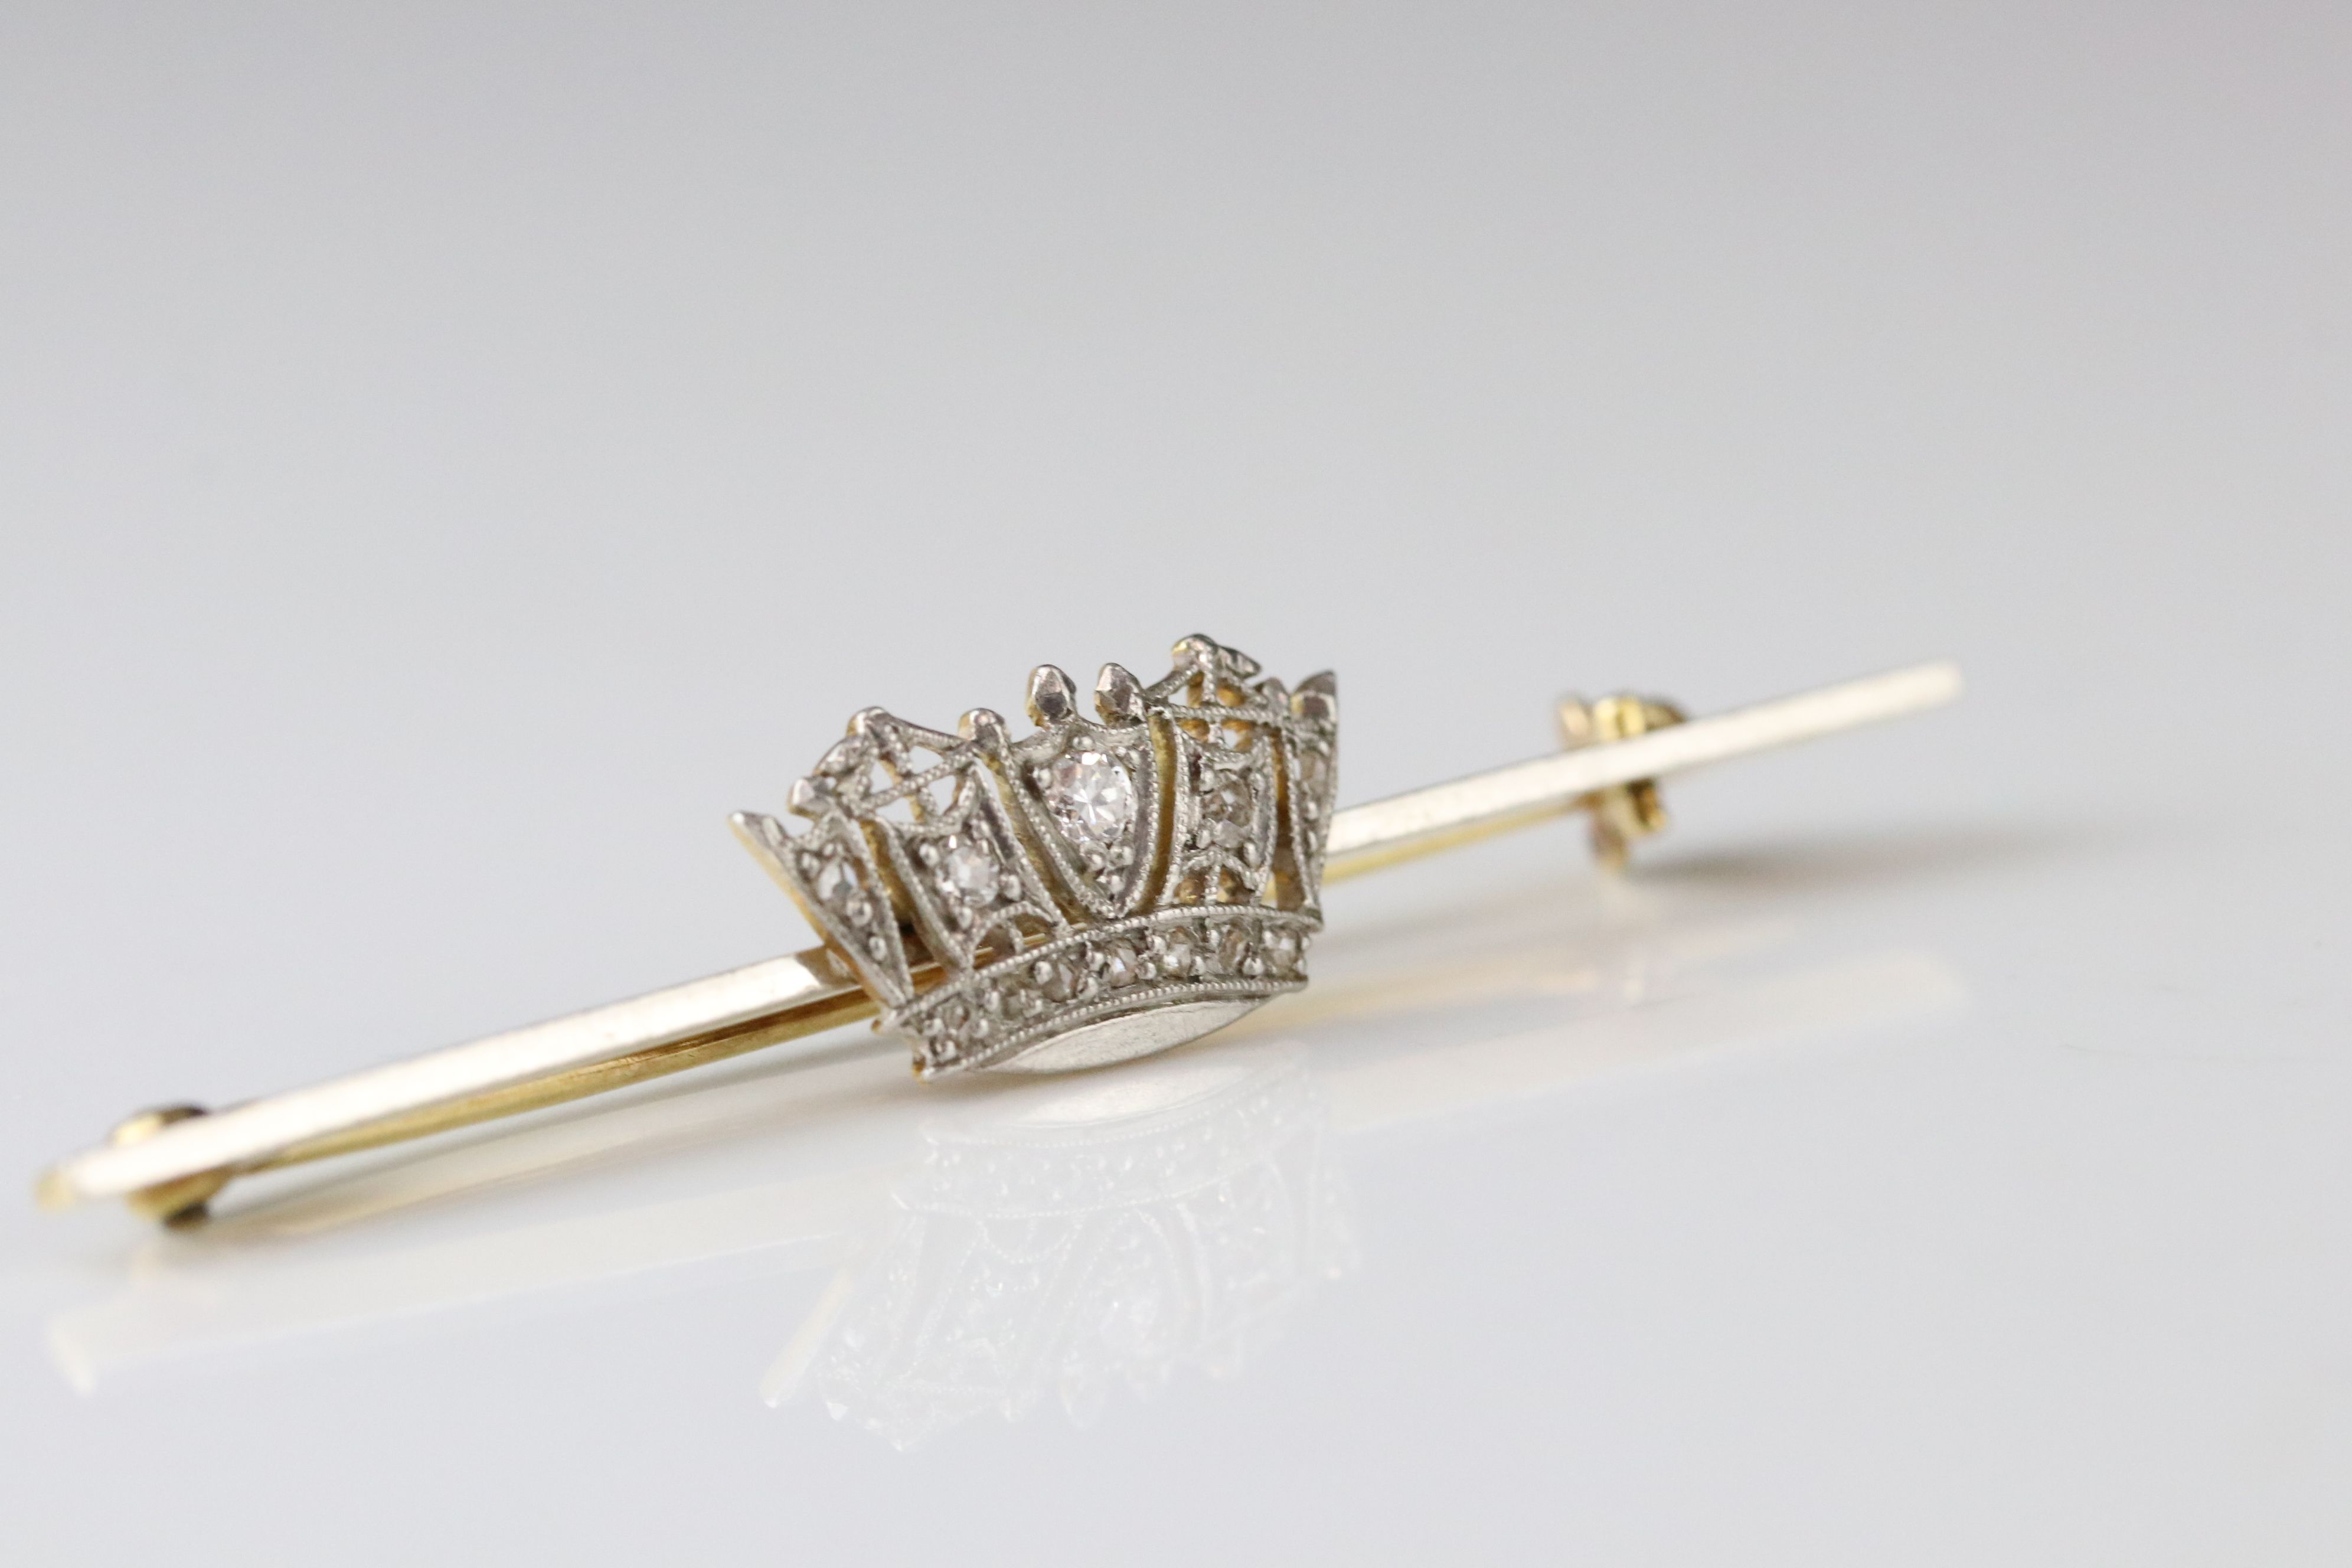 Diamond 18ct yellow gold platinum set Merchant Navy sweetheart brooch, a small round brilliant cut - Image 3 of 5